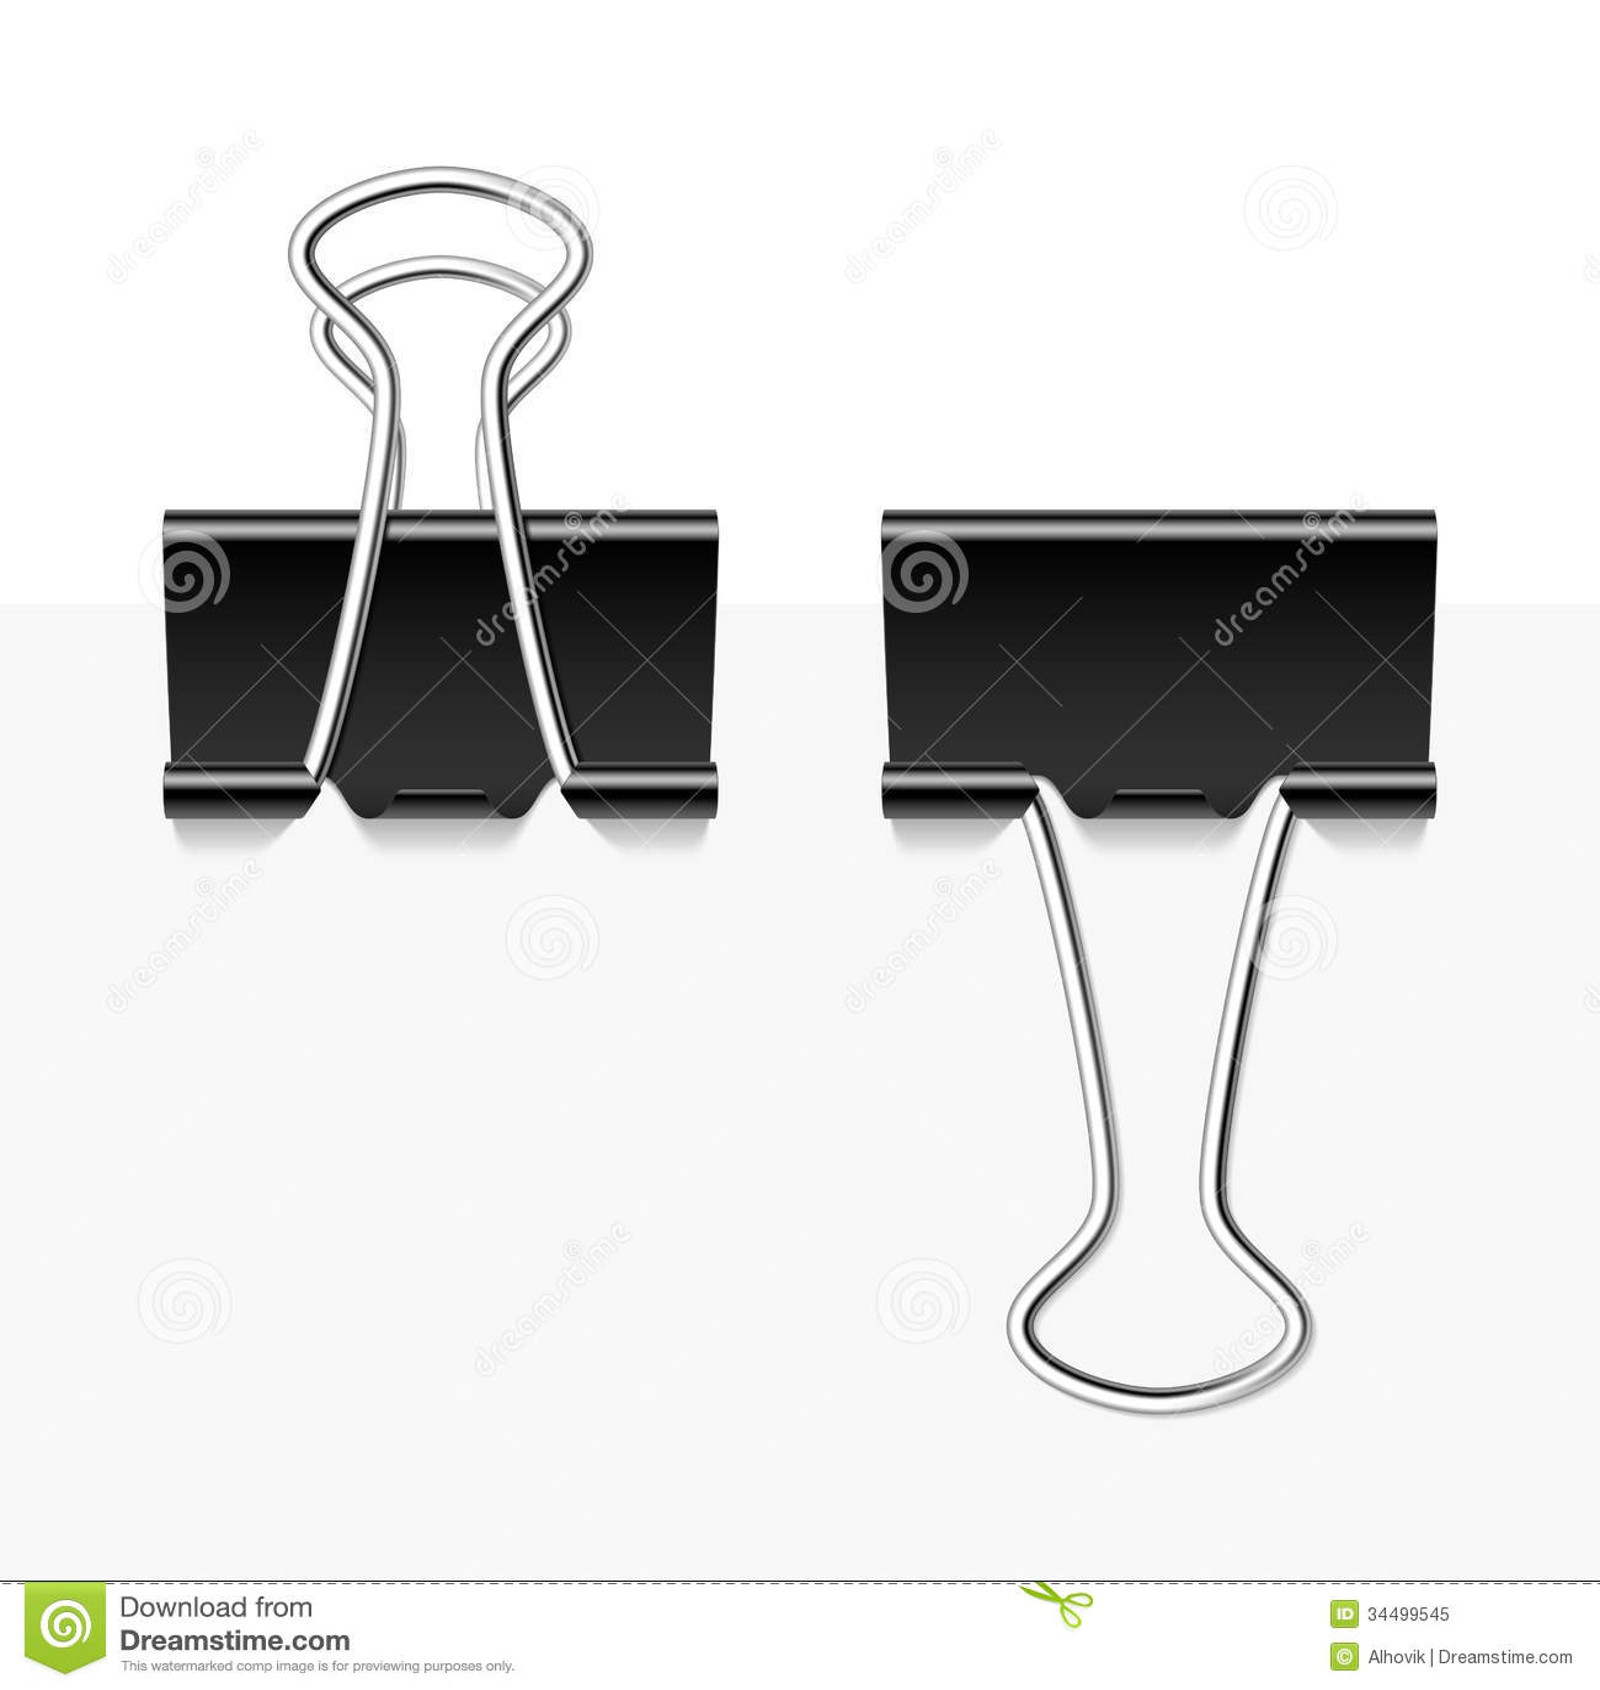 Black metal binder clips